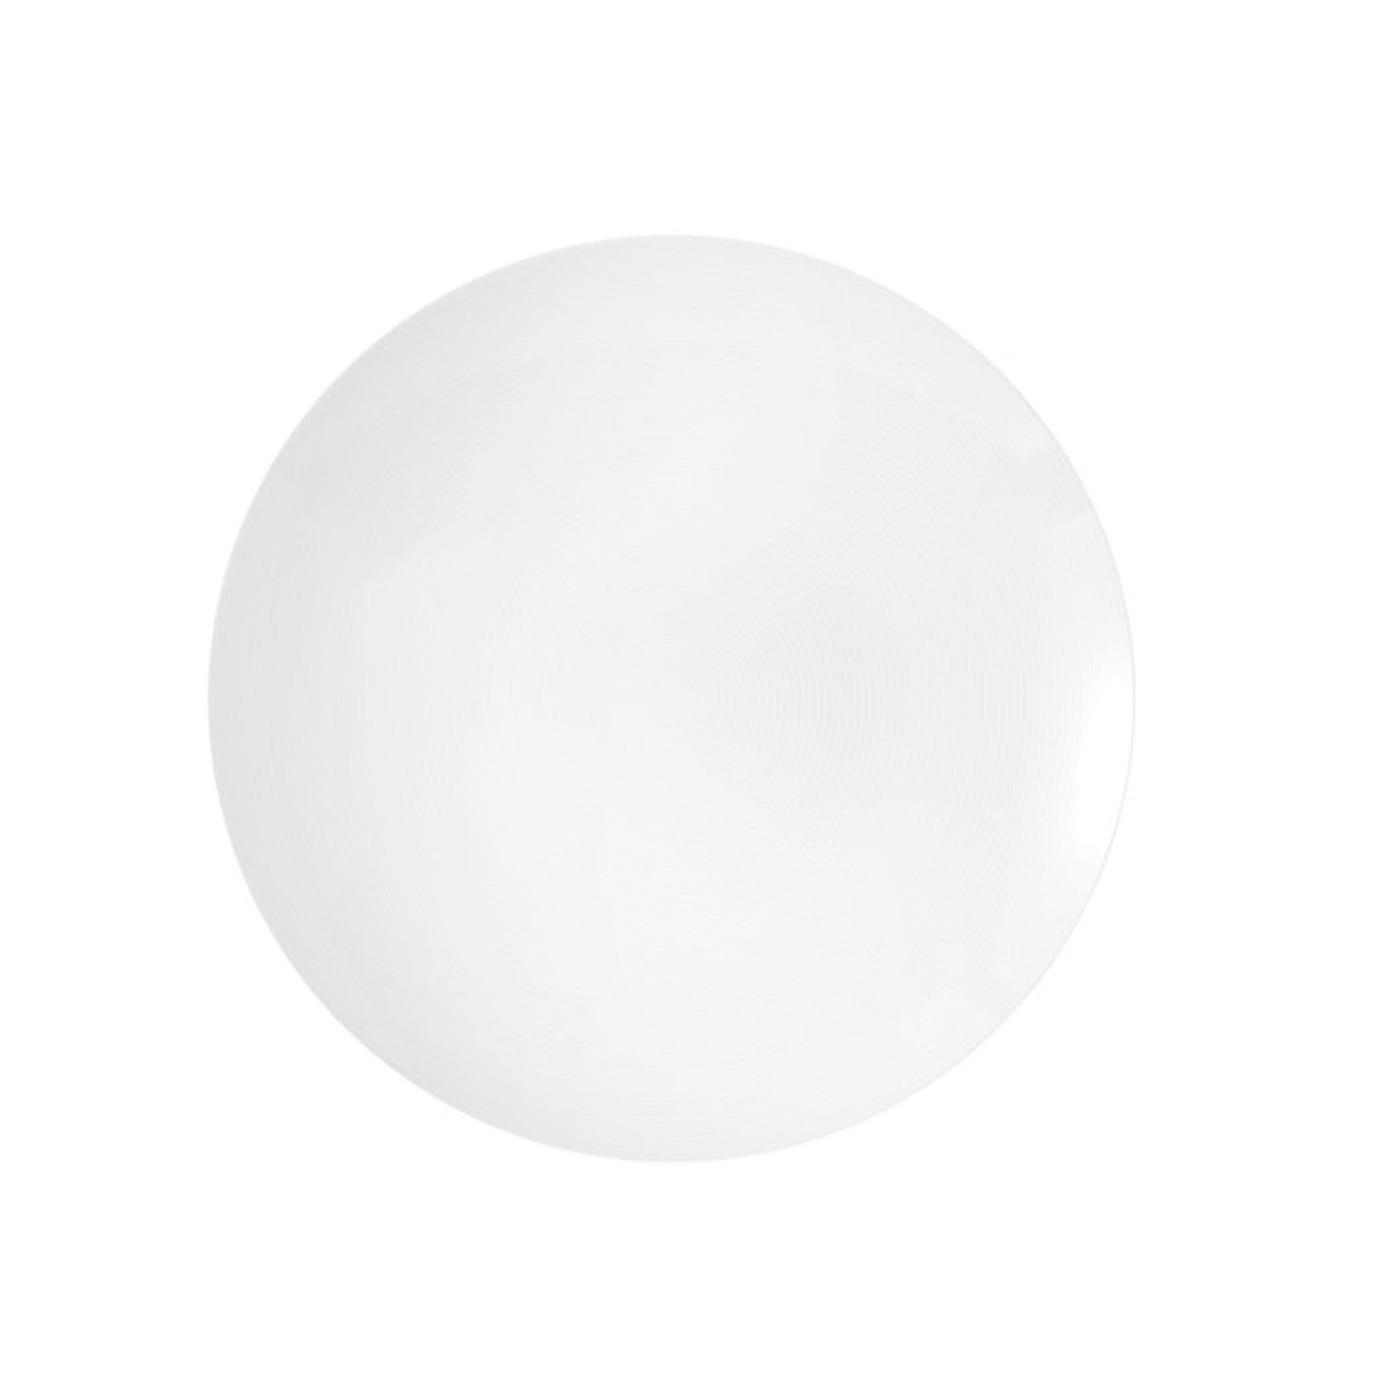 Thomas Rosenthal Loft White Dessert Plate